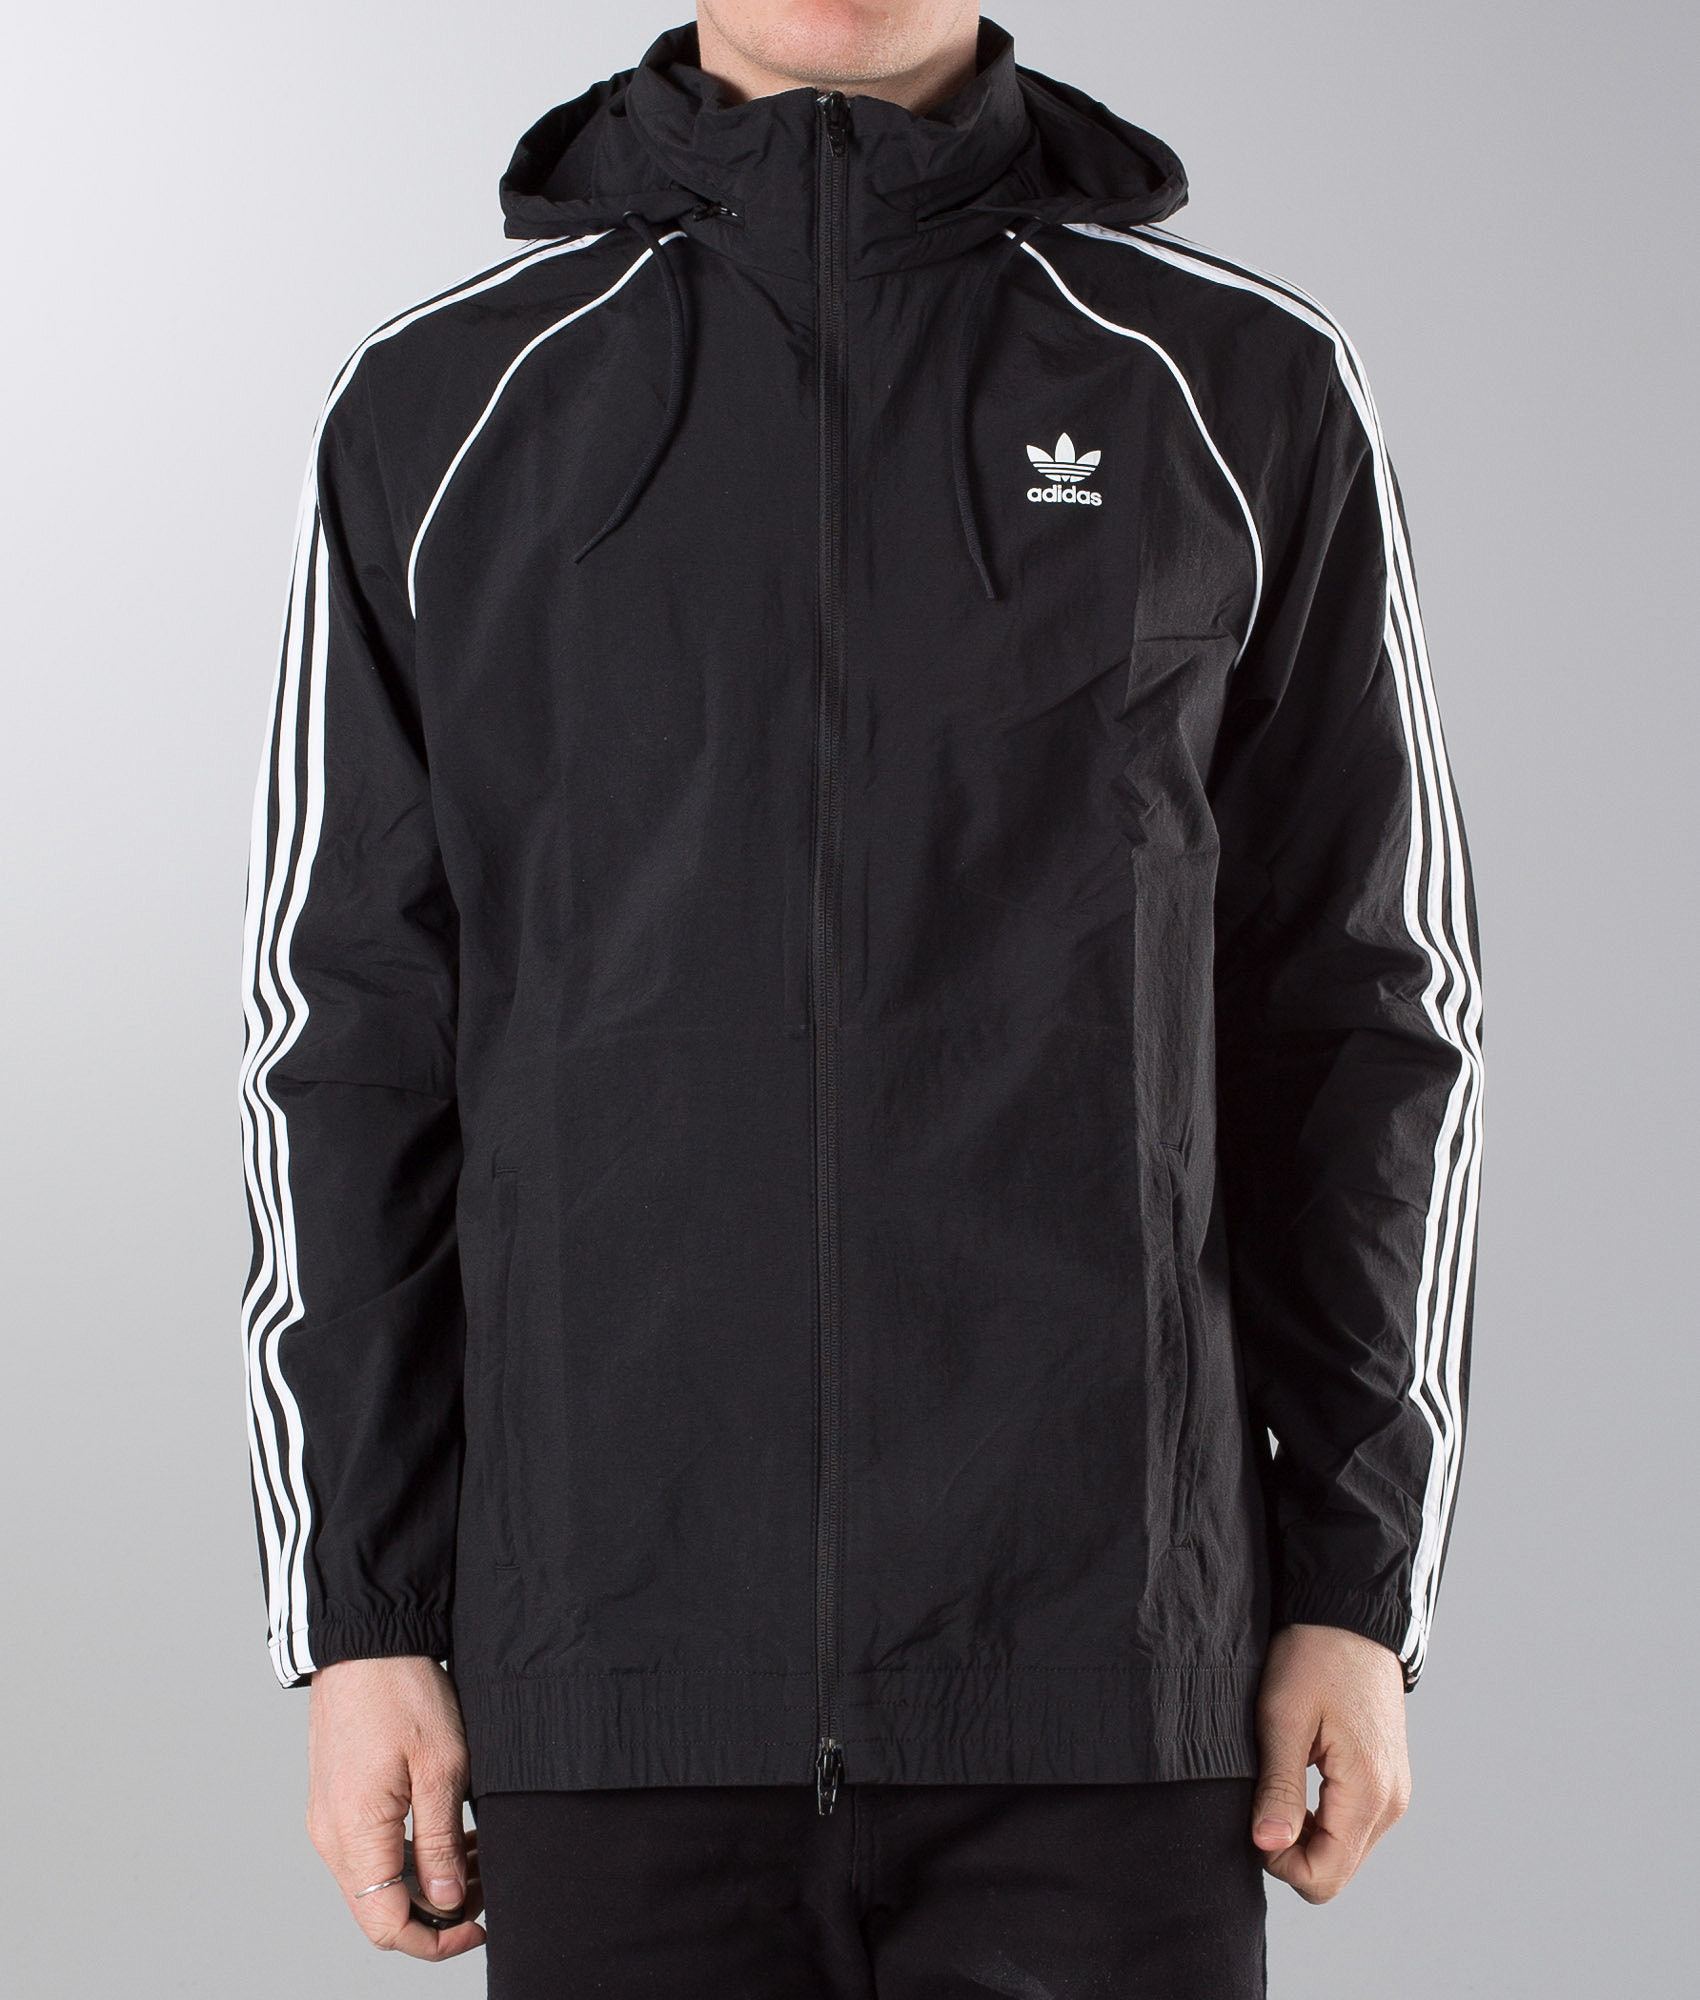 078fb9c3cb Adidas Originals SST Jacket Black - Ridestore.com